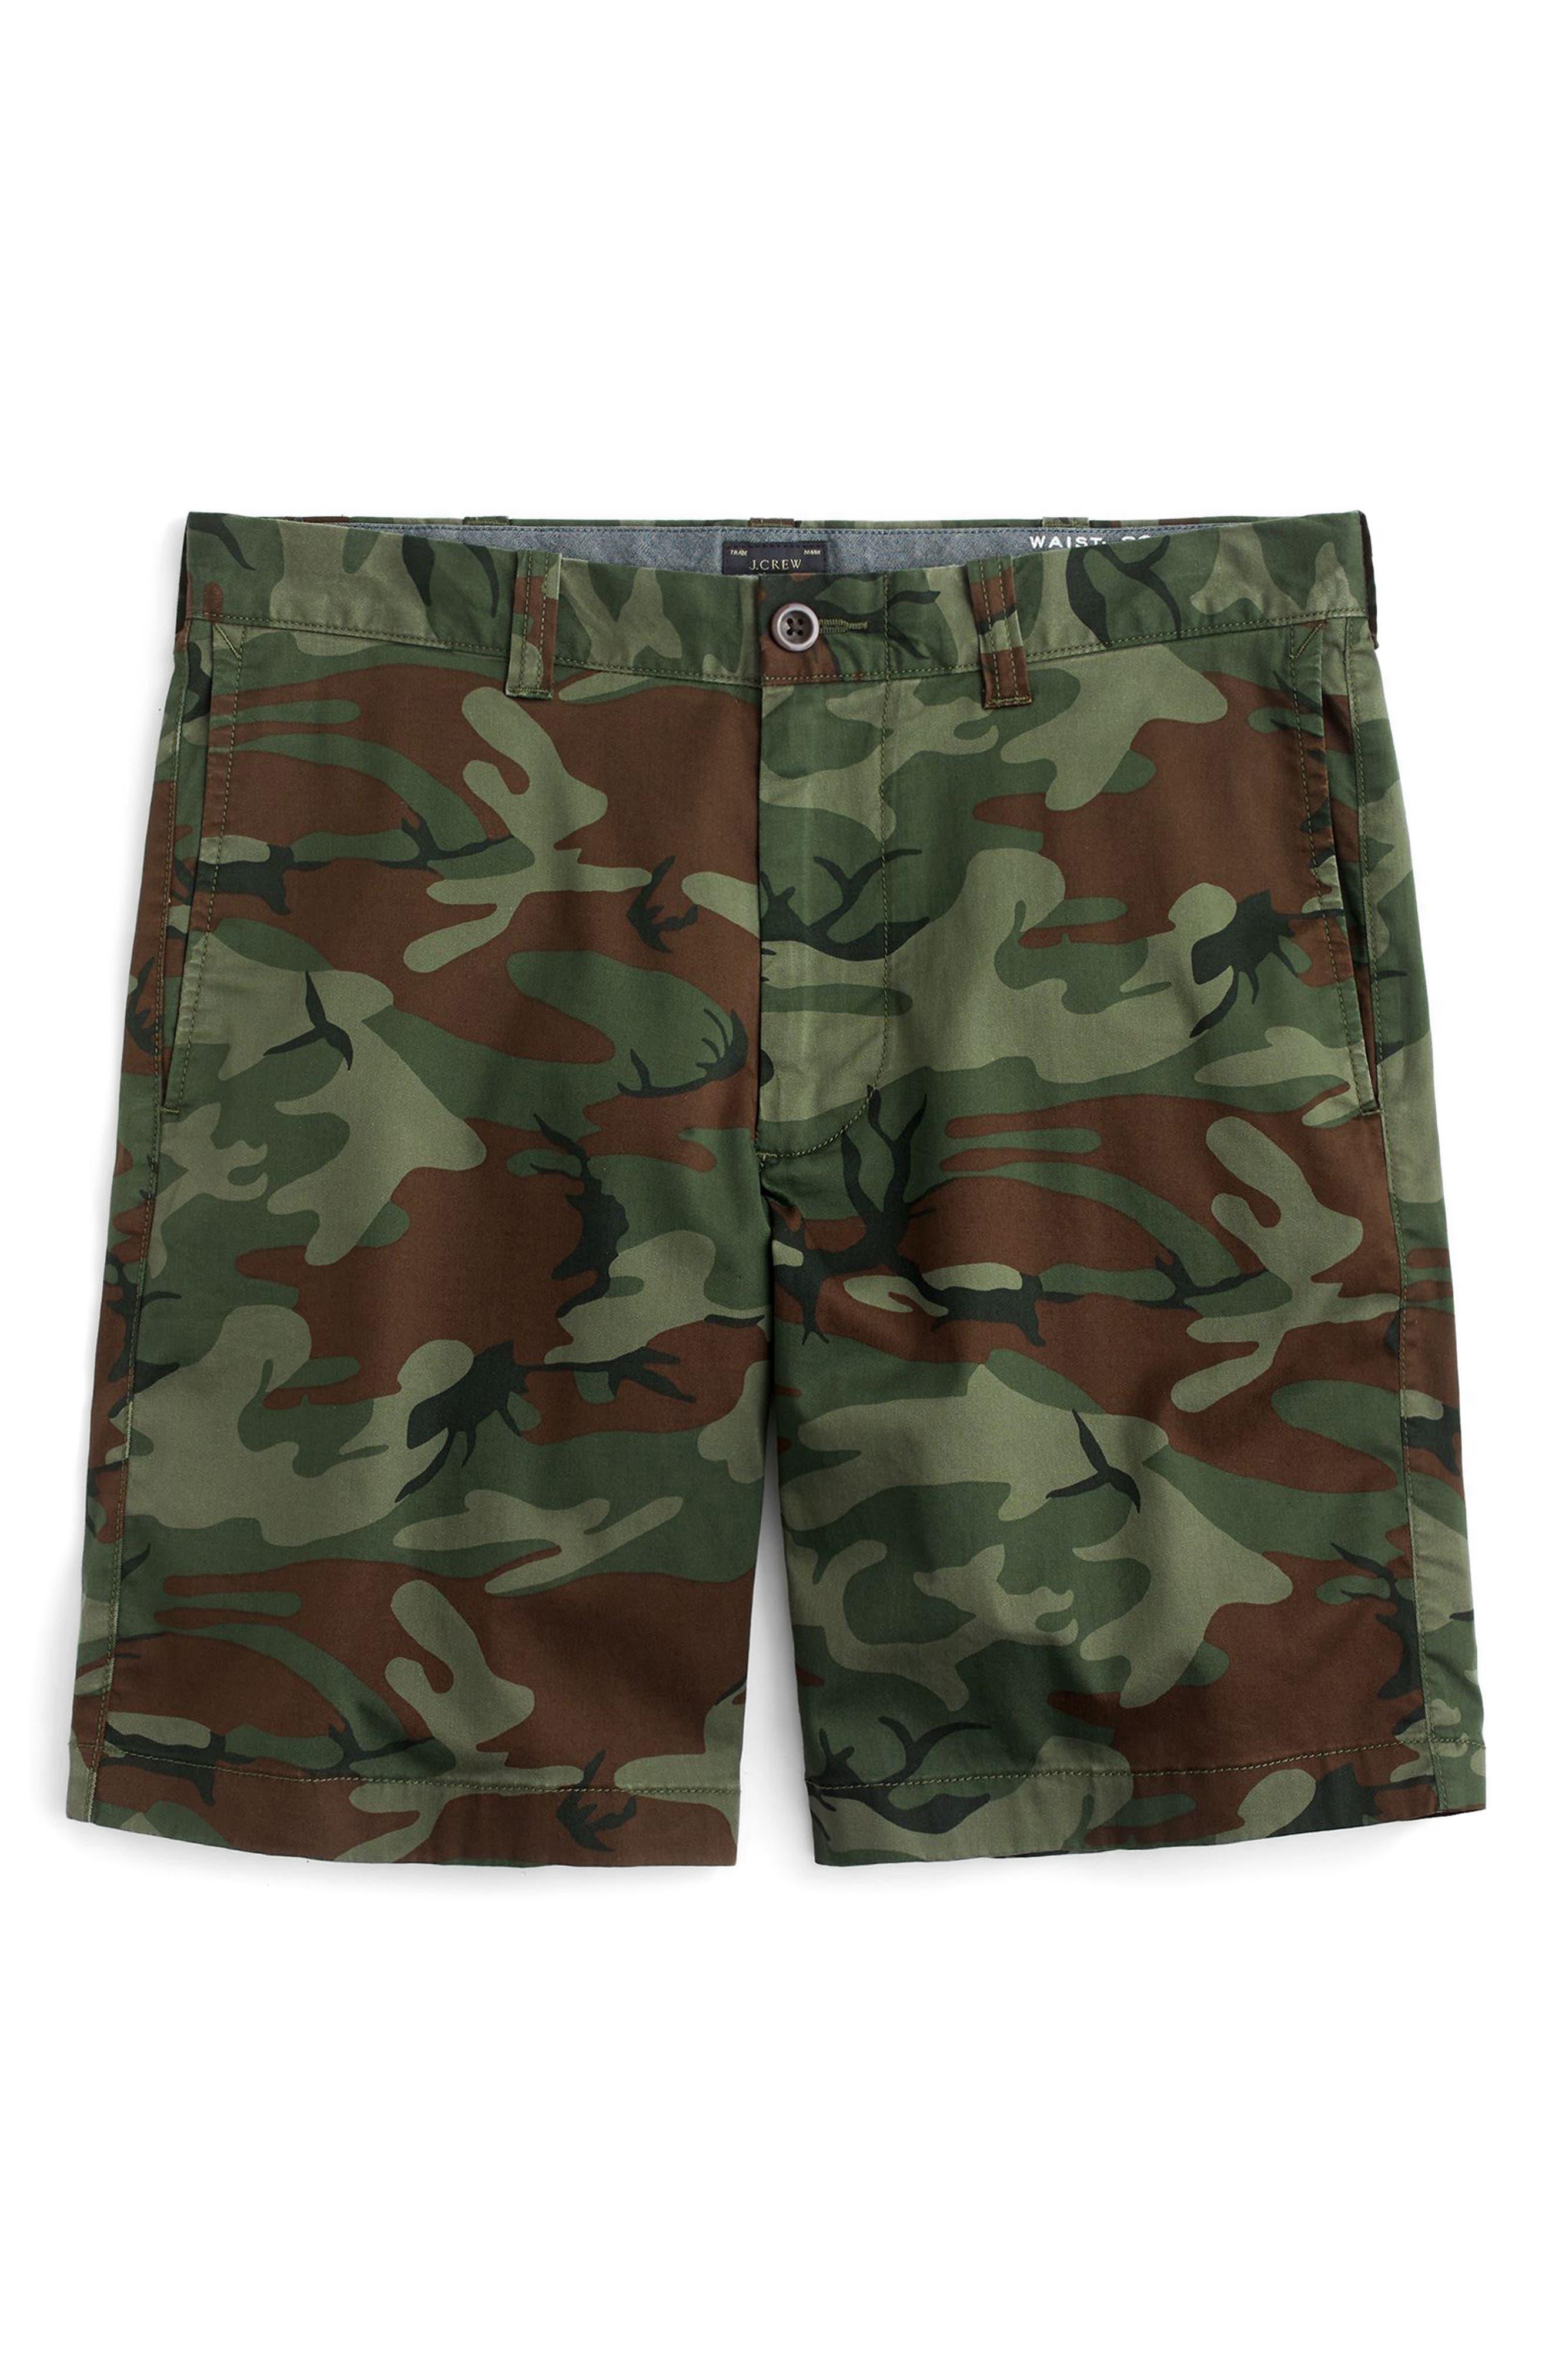 J.Crew Stretch Camo Shorts,                             Alternate thumbnail 4, color,                             Camo Wamo